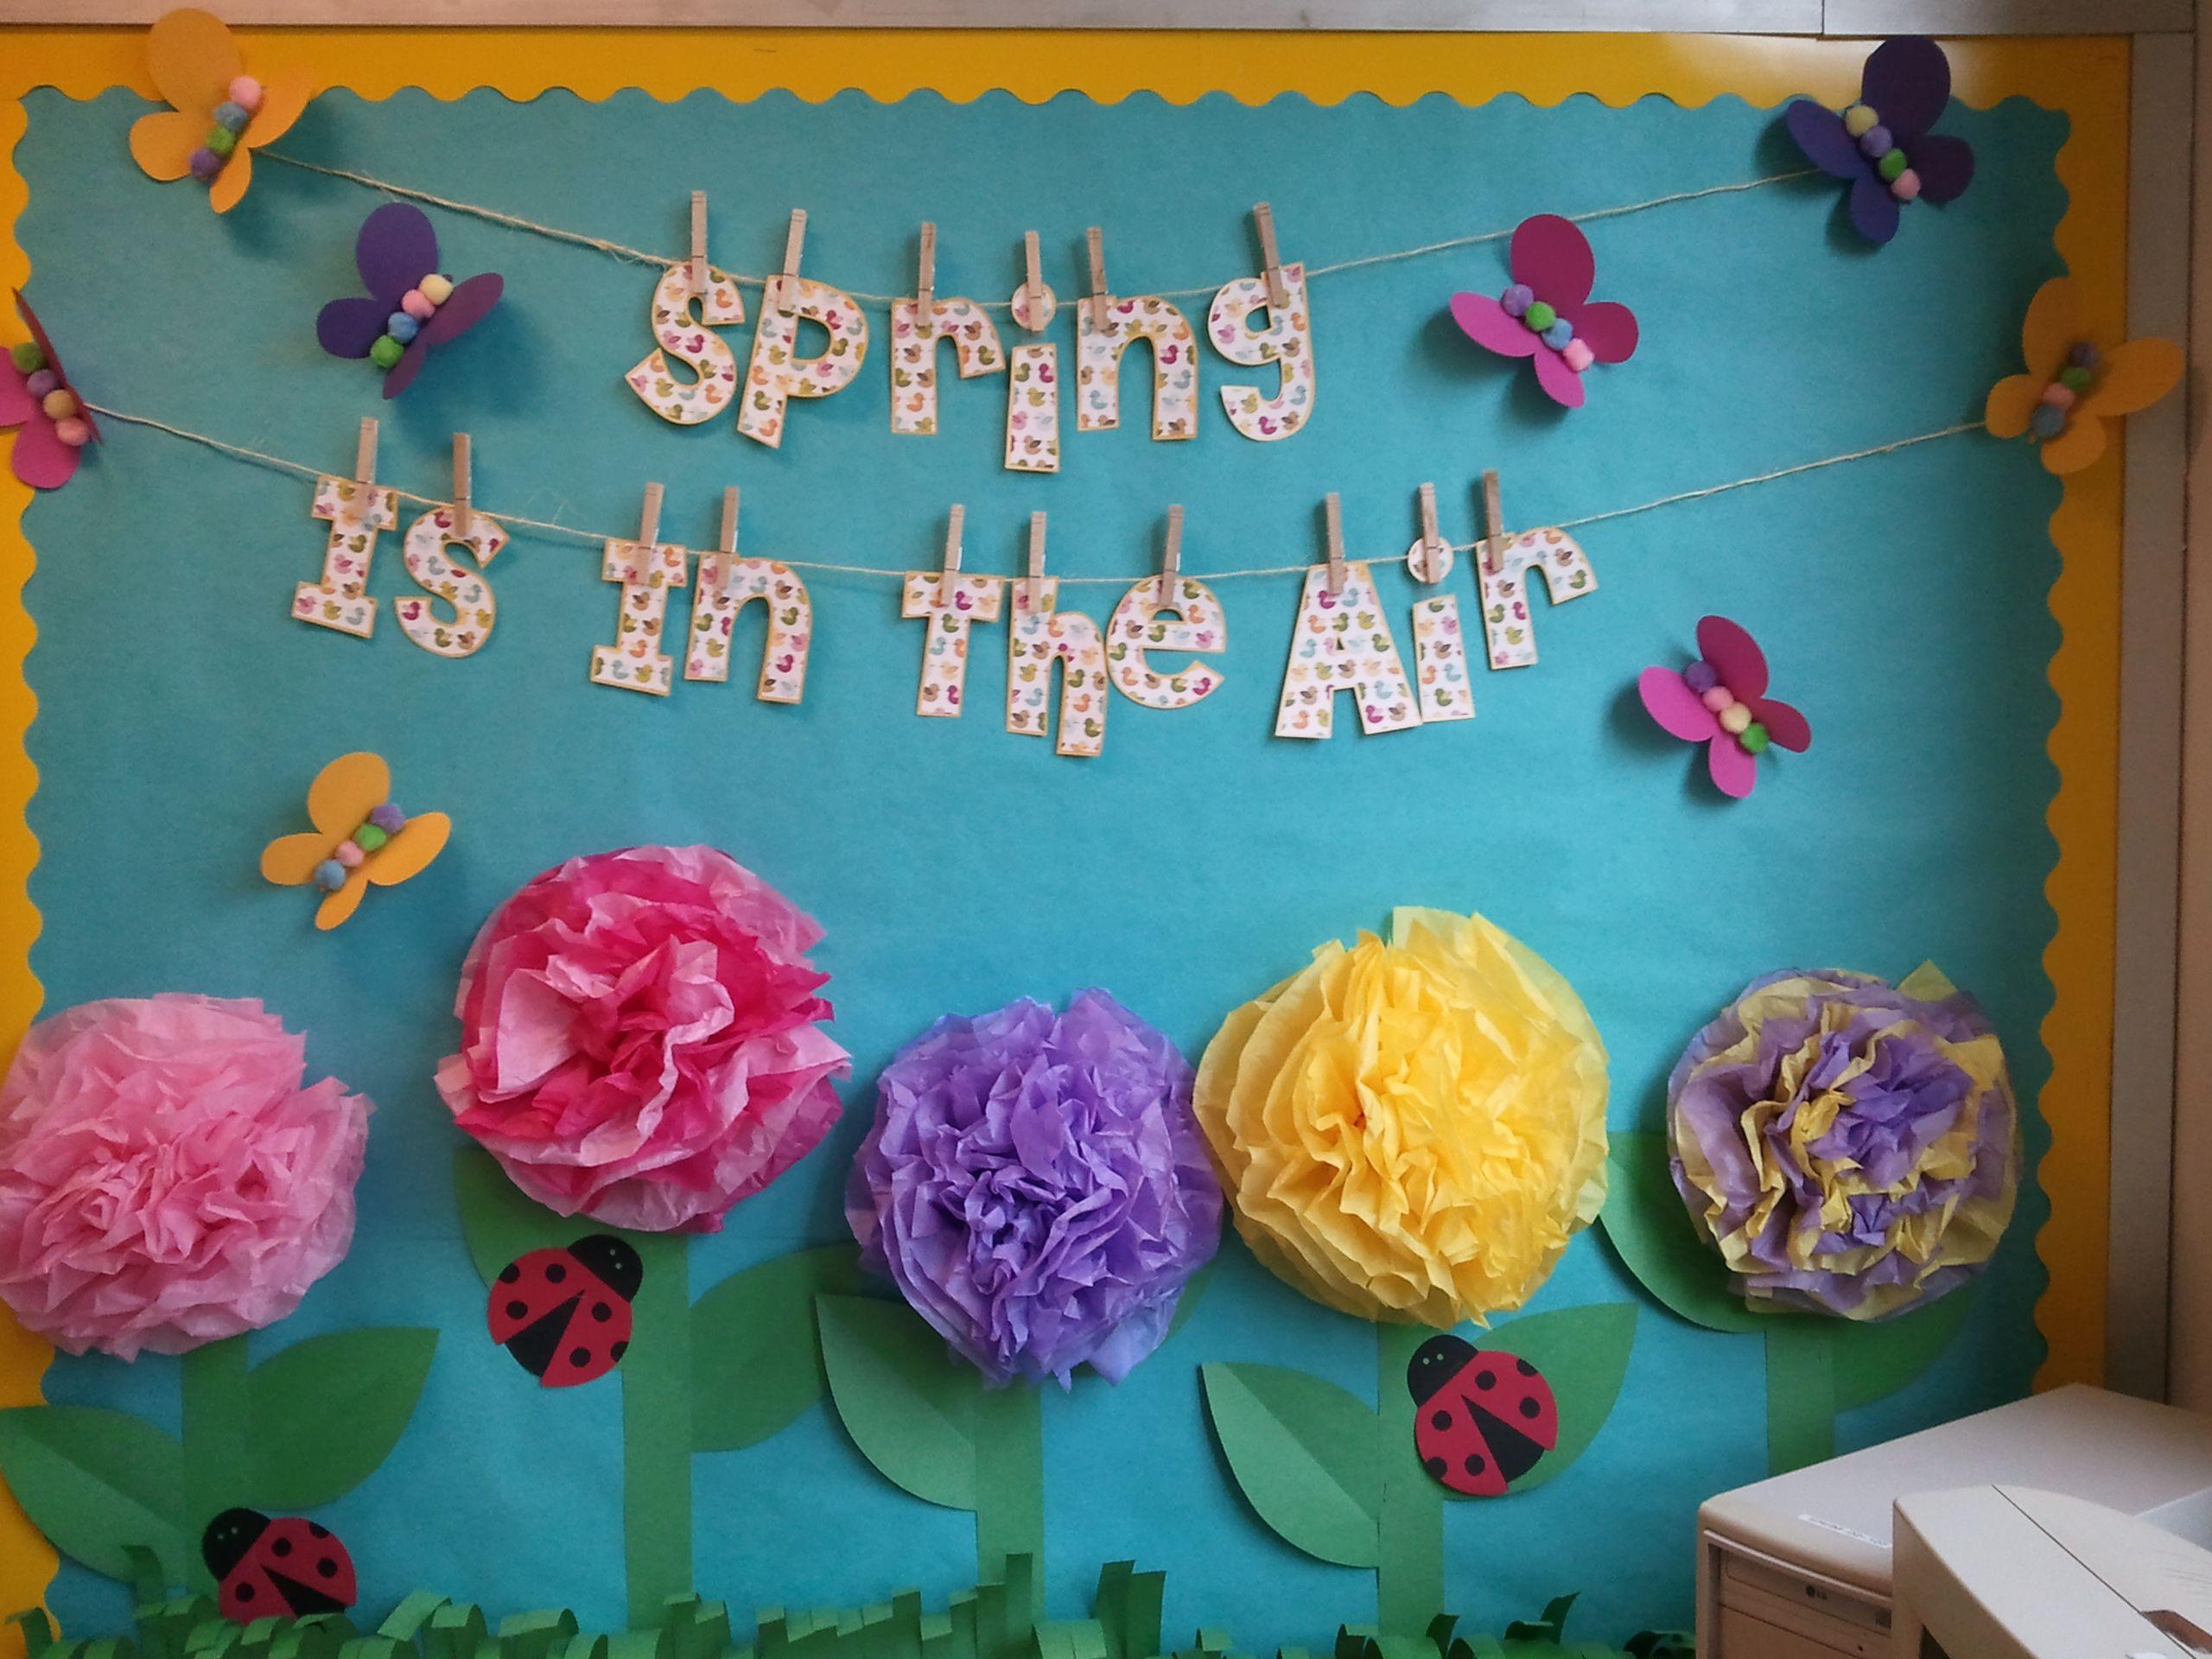 5Th Grade Easter Party Ideas  Best 25 4th grade classroom ideas on Pinterest